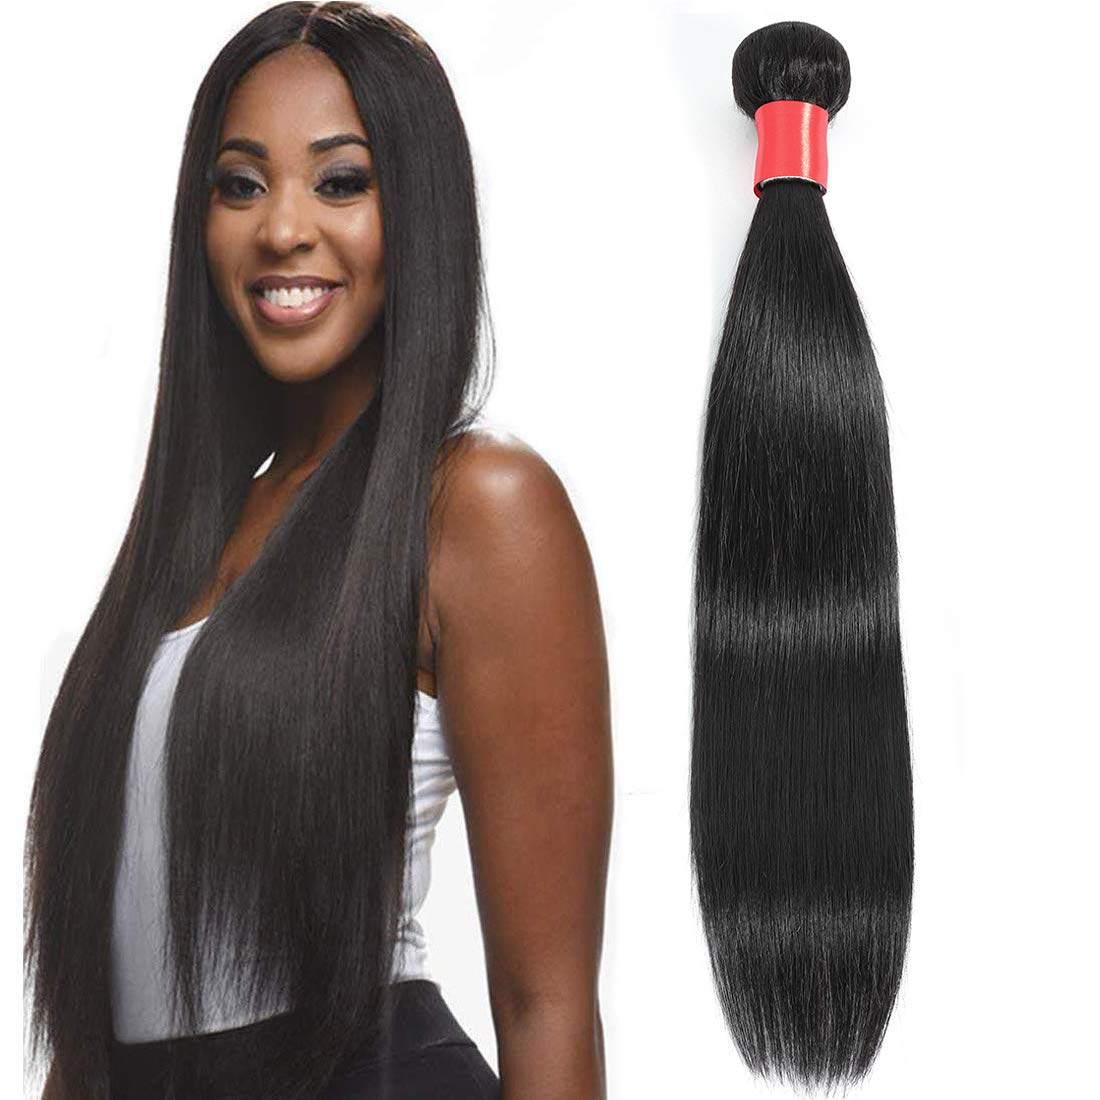 Lizourey Hair Award Unprocessed Brazilian Straight Max 82% OFF Virgin On